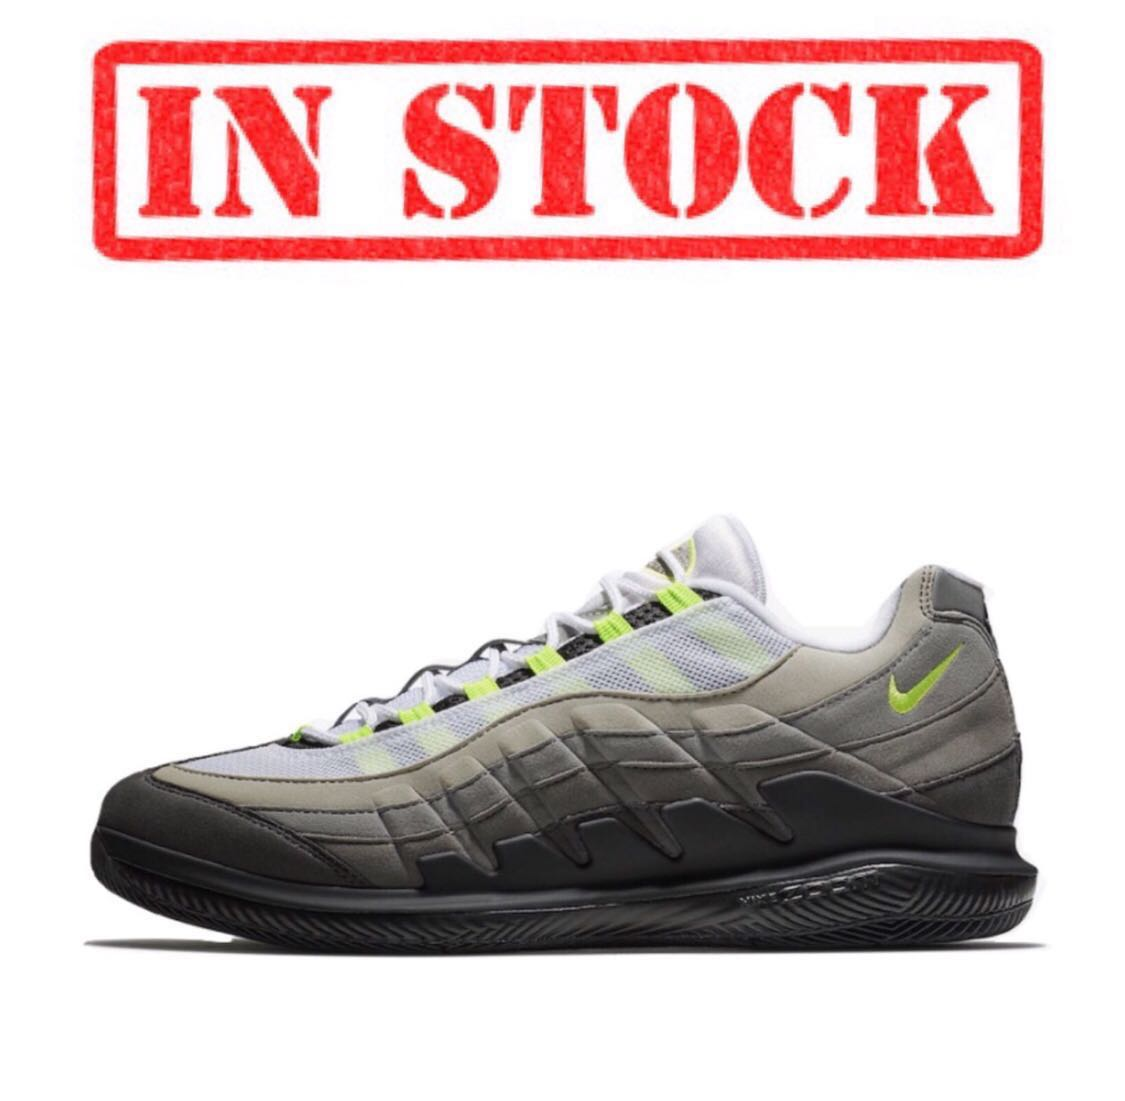 2d0030dc15f In Stock Men s Nikecourt Vapor RF Air Max 95